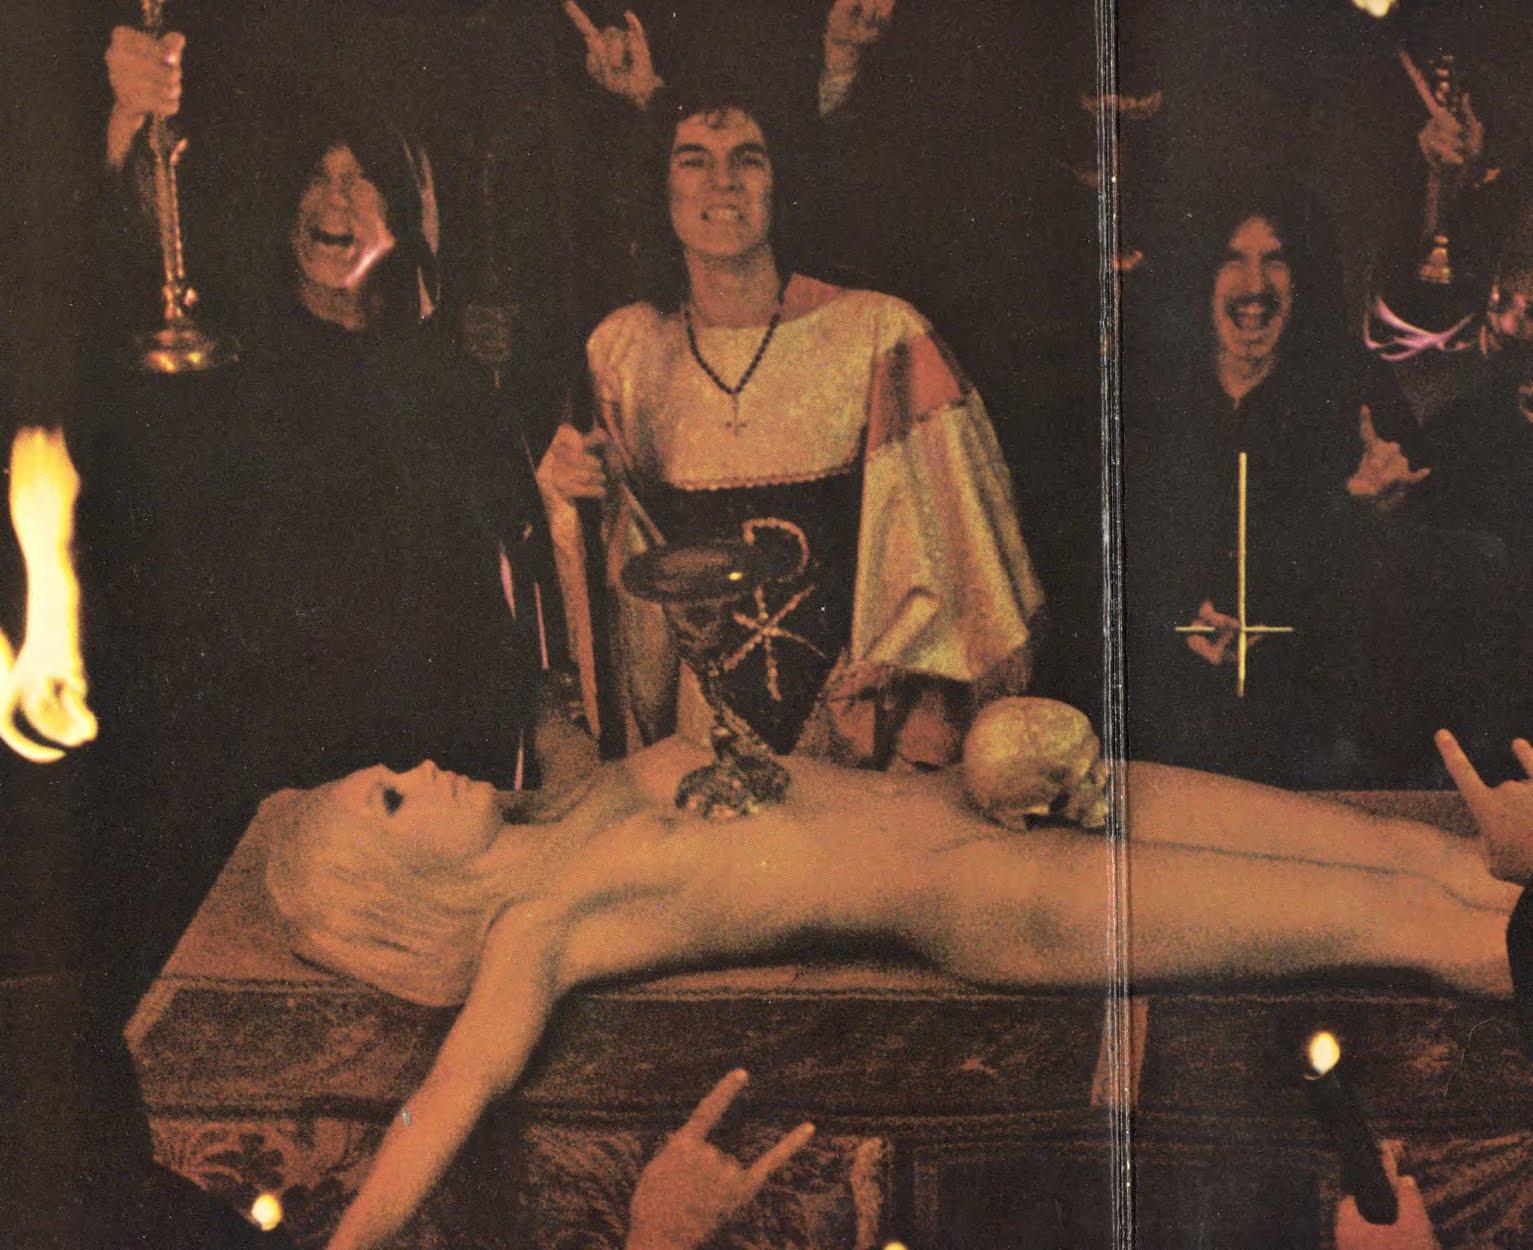 http://apiemistika.lt/wp-content/uploads/2013/04/juodosios-misios-satanistai.jpg